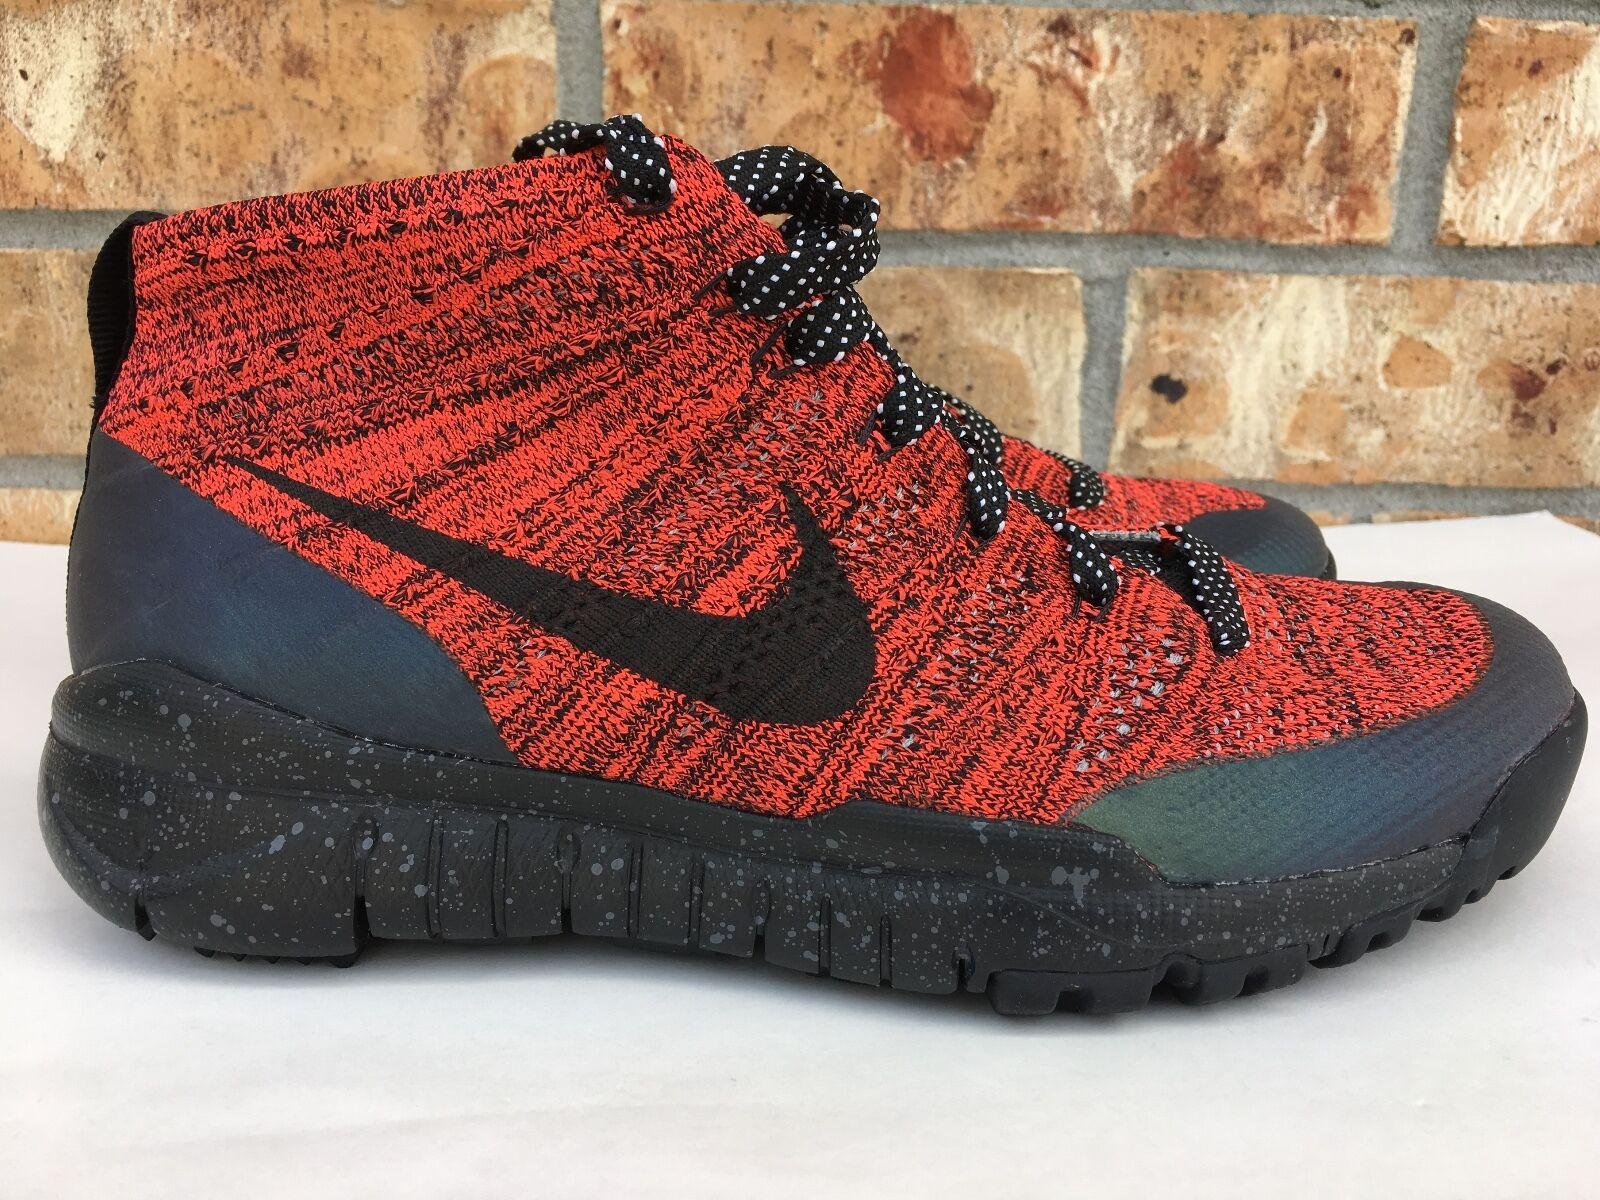 0bd93e44d1 Women's Nike Flyknit Trainer Chukka FSB FSB FSB Hologram Reflective Size 8  805093-603 7530dc